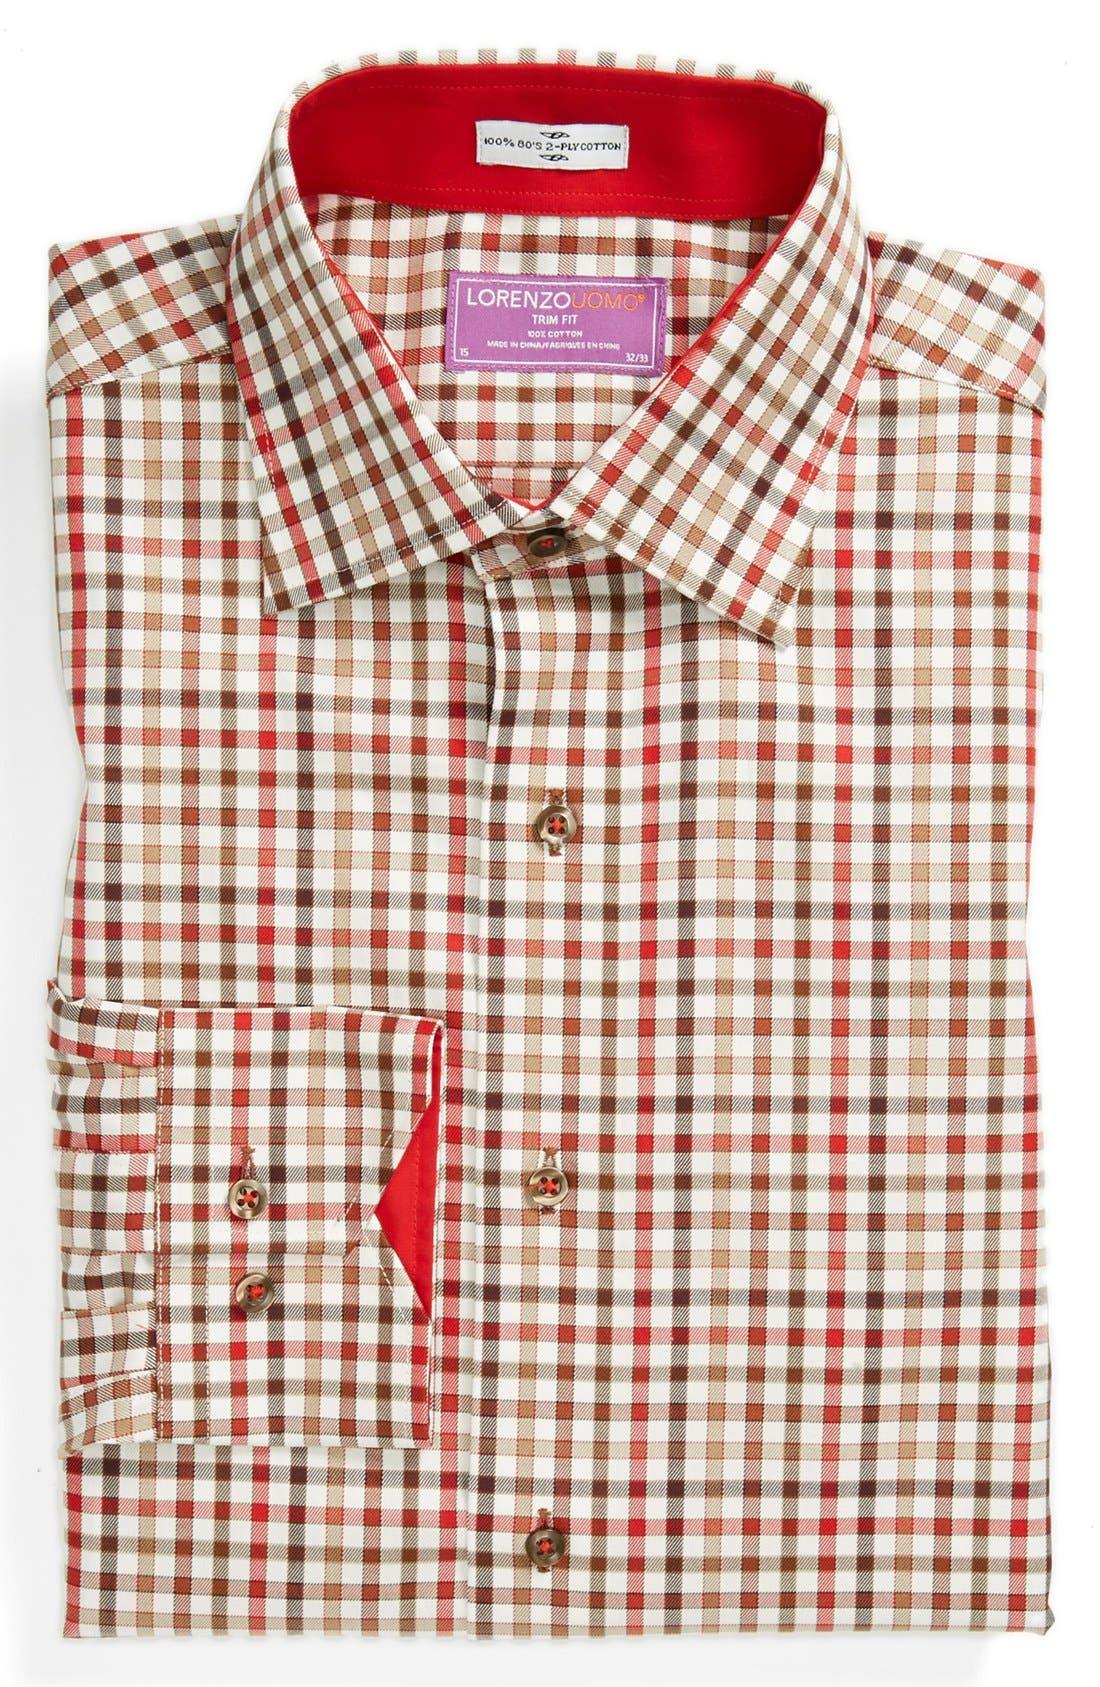 Alternate Image 1 Selected - Lorenzo Uomo Trim Fit Dress Shirt